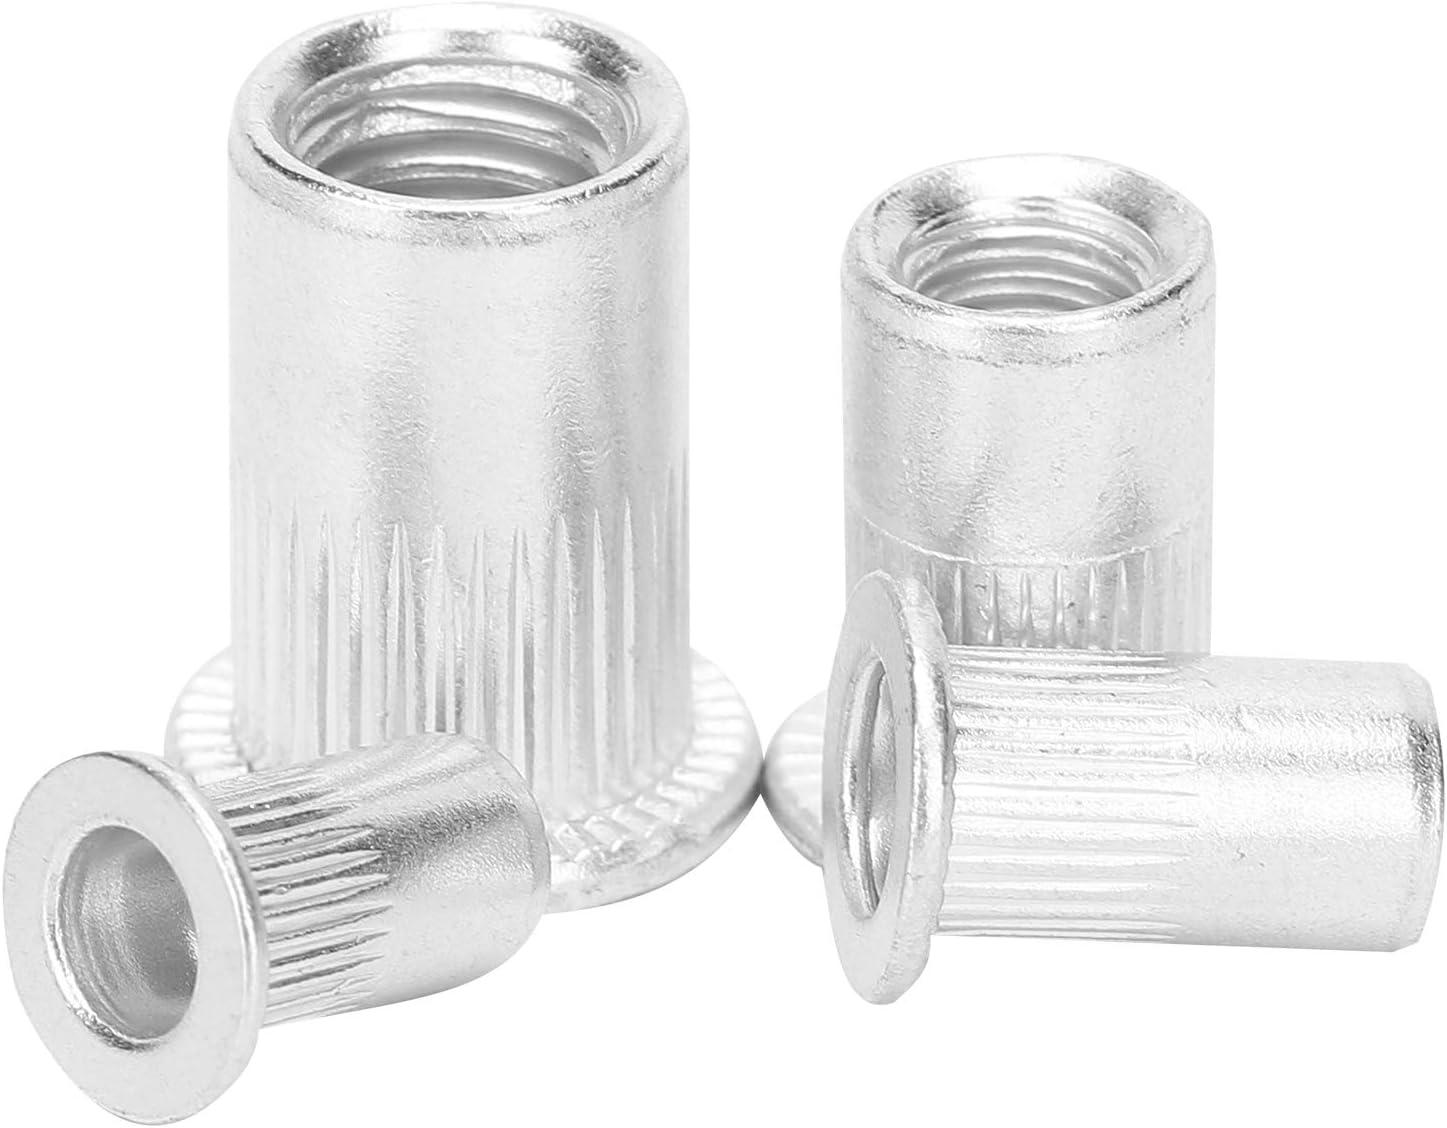 Heaveant Tuercas remachadoras ciegas 100 Piezas Juego de Tuercas remachadoras ciegas Tuerca Remachadora de Aluminio M4//M5//M6//M8 Accesorios de Hardware